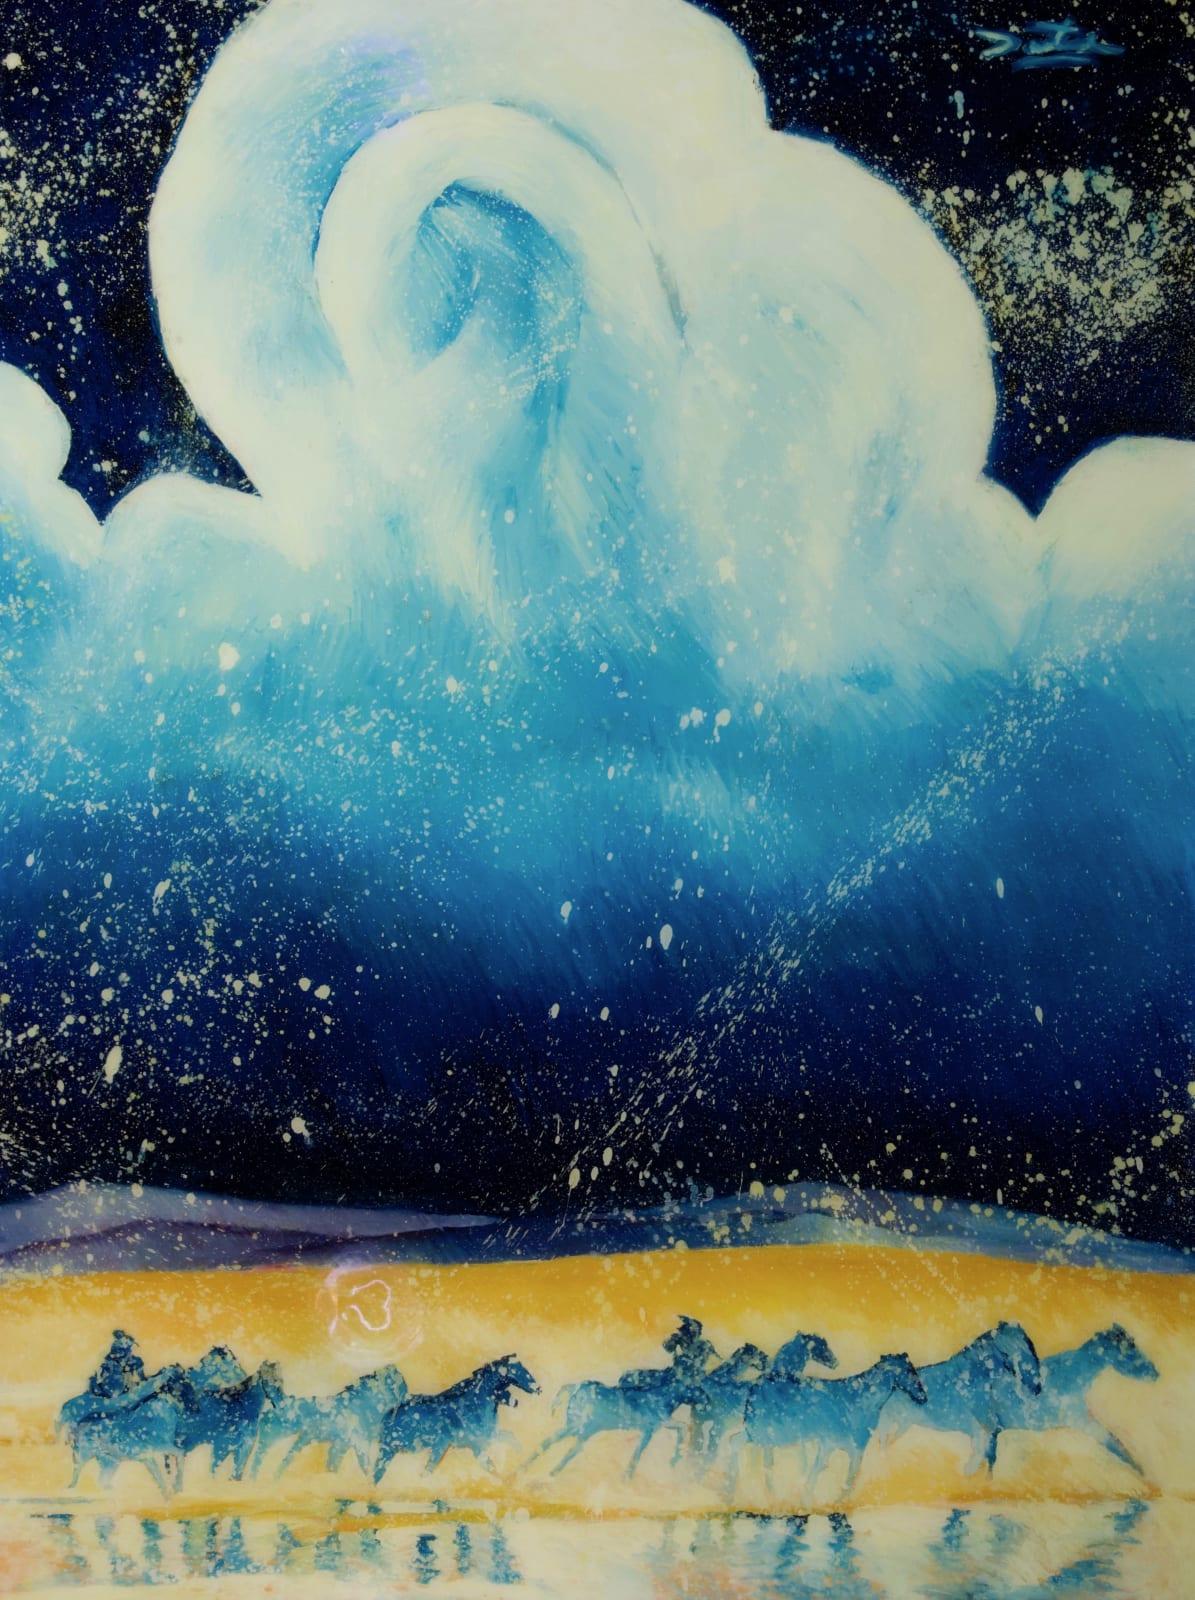 Dante Biss-Grayson, Storm on the Horizon